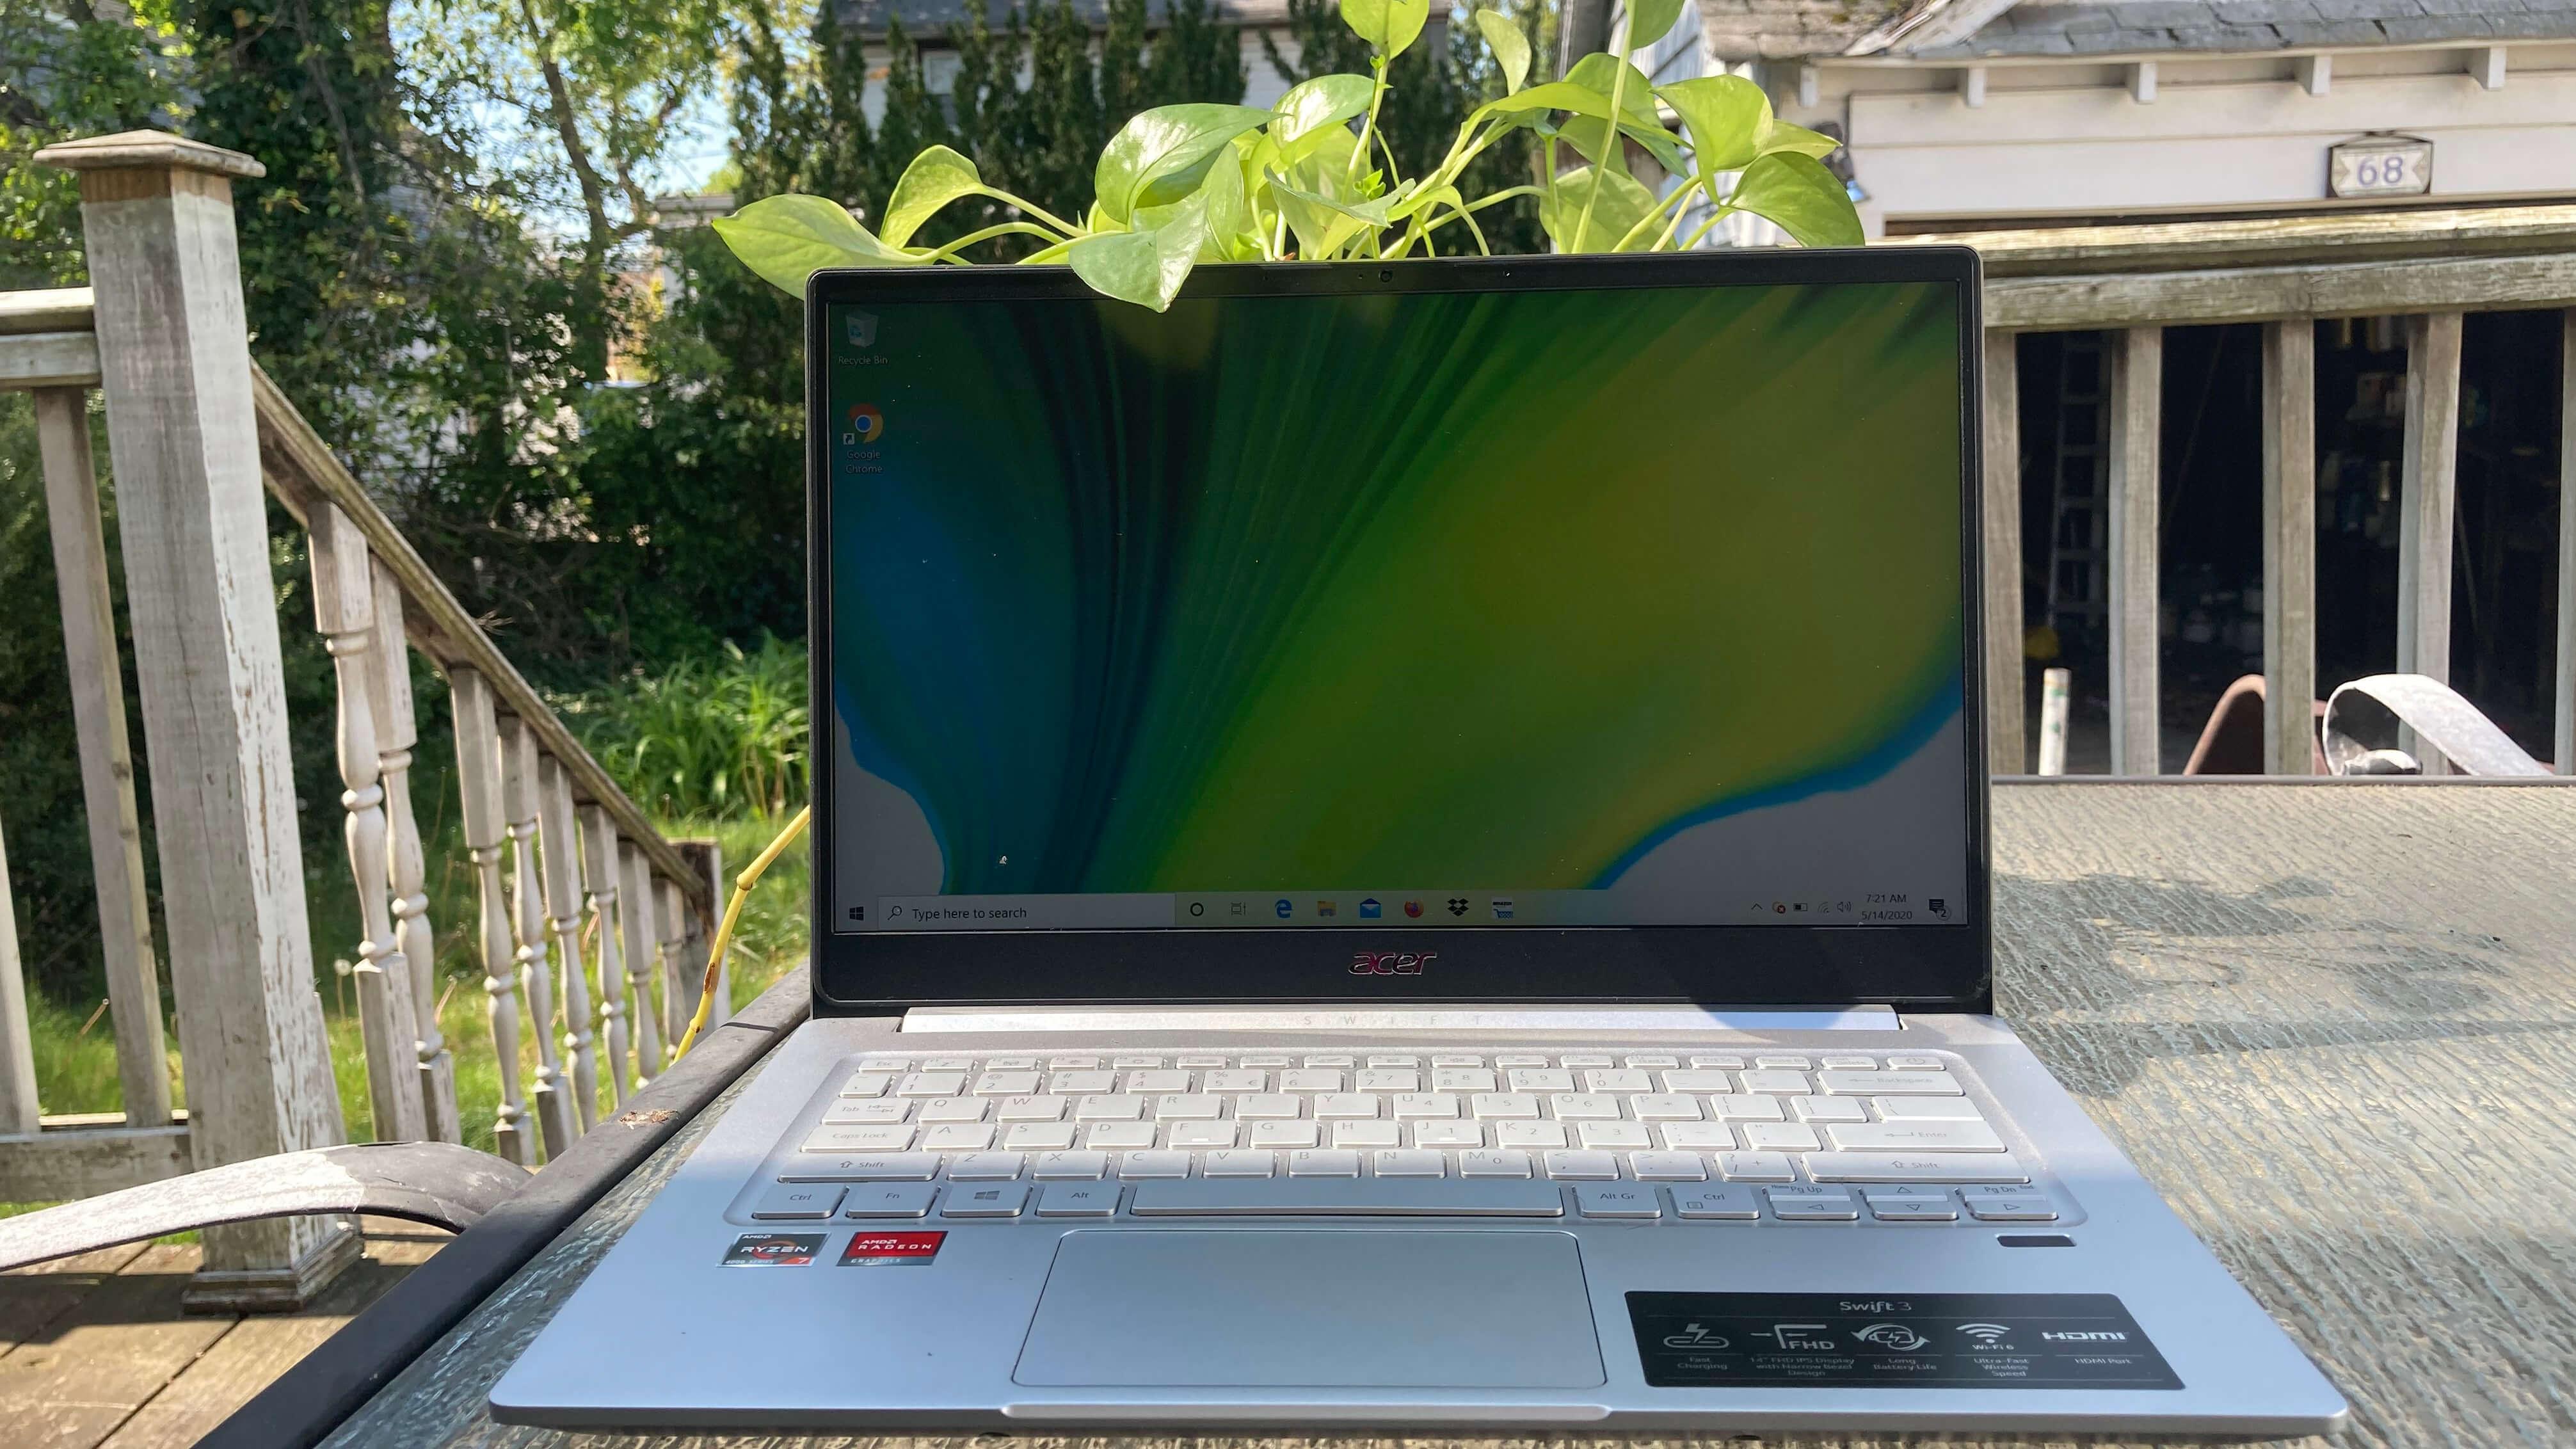 Tong Hop 15 Laptop Tot Nhat Cho Sinh Vien 8